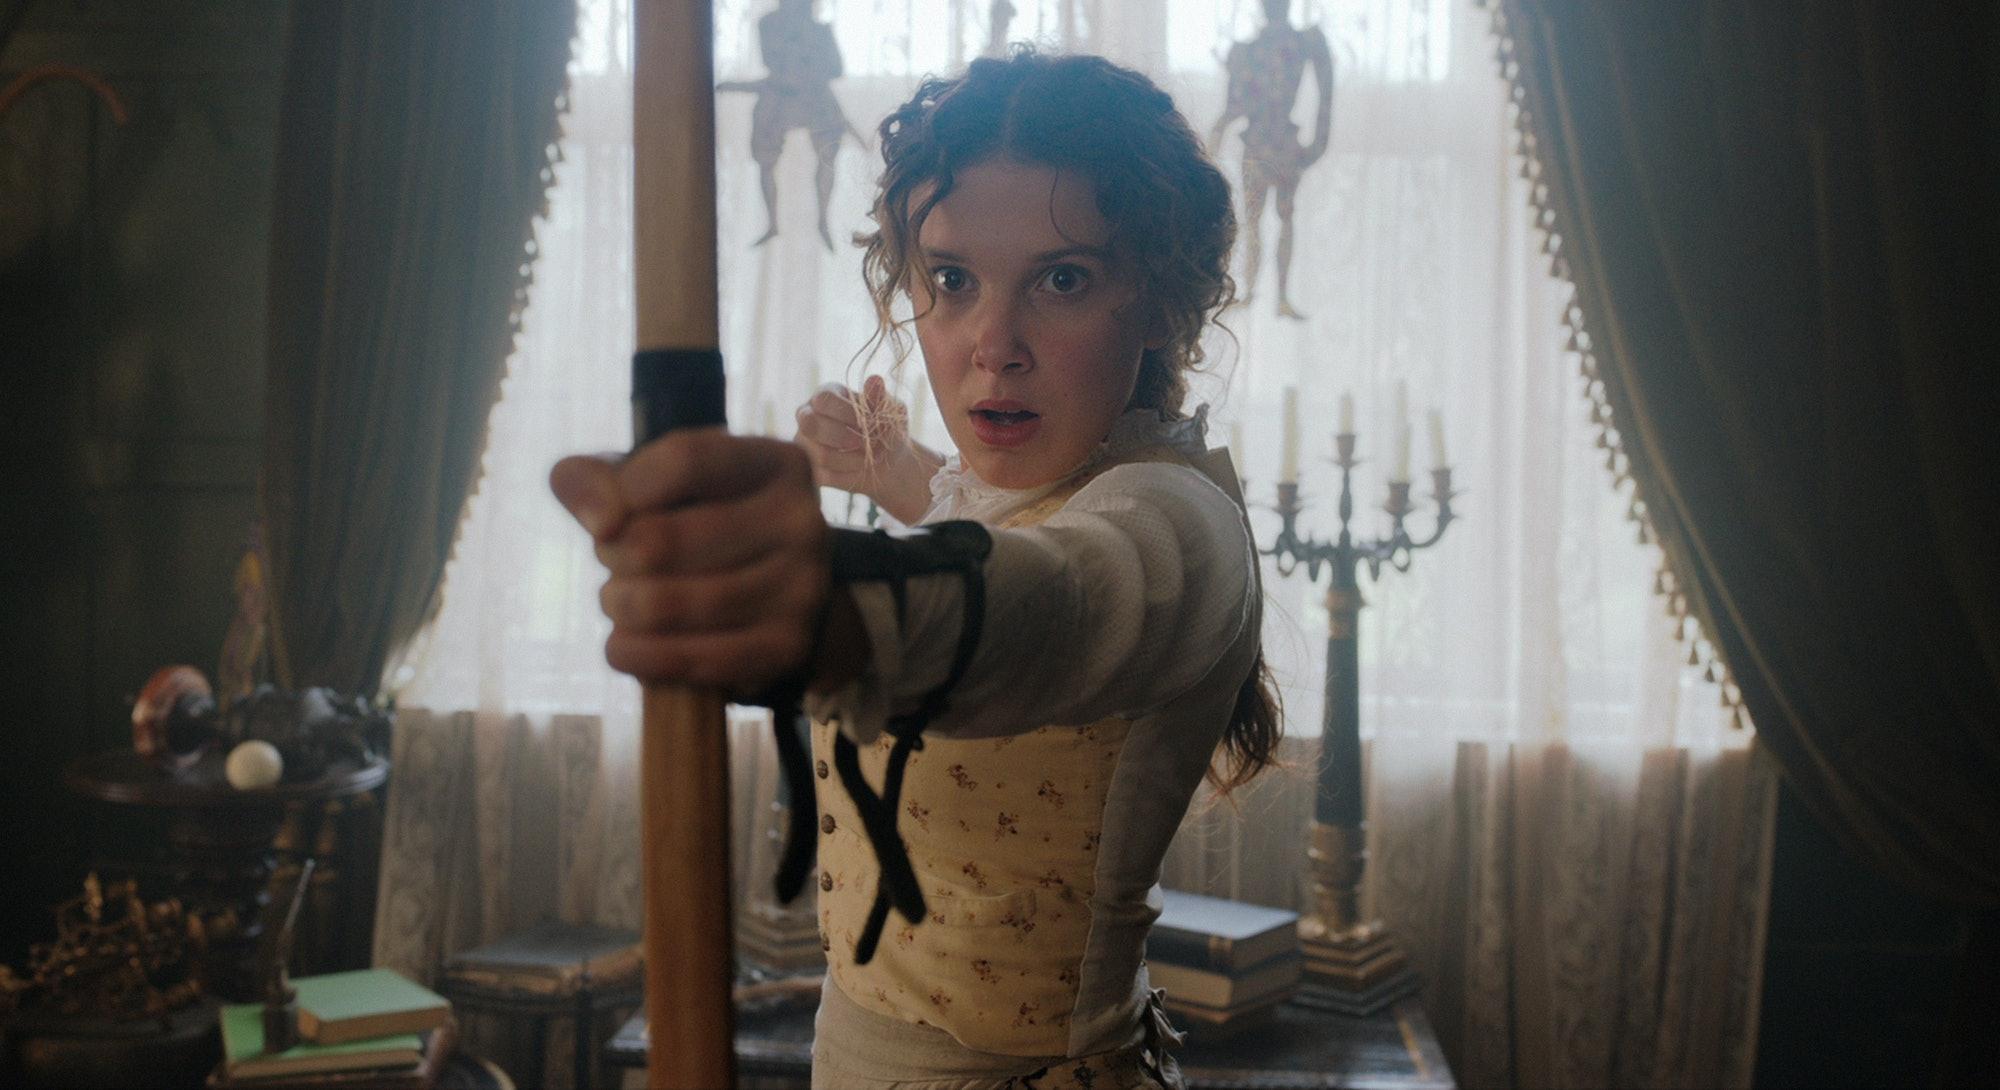 Millie Bobby Brown in Netflix's 'Enola Holmes'